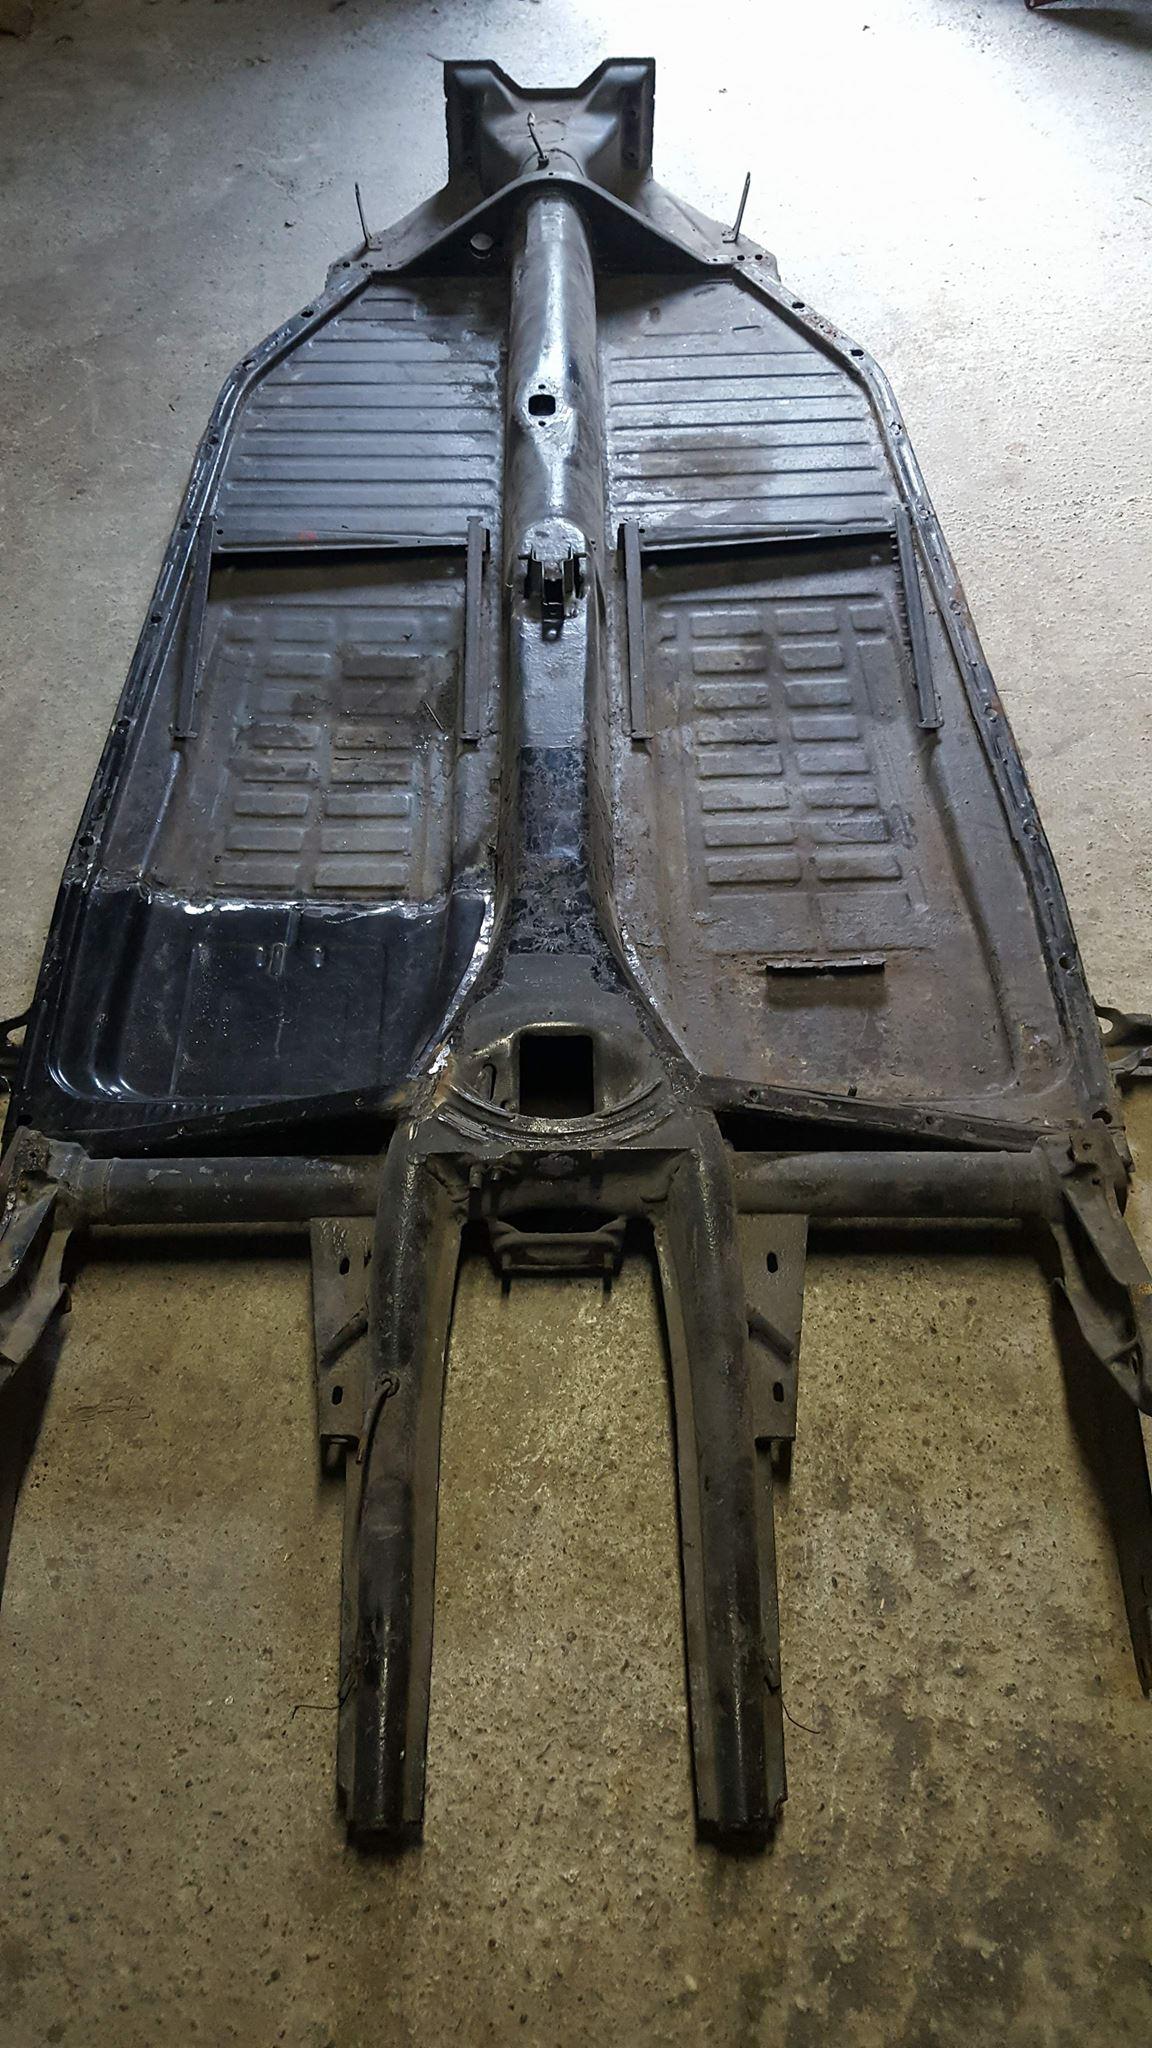 projet remontage buggy super GP 74  16708122396719101552564827441391610140005o